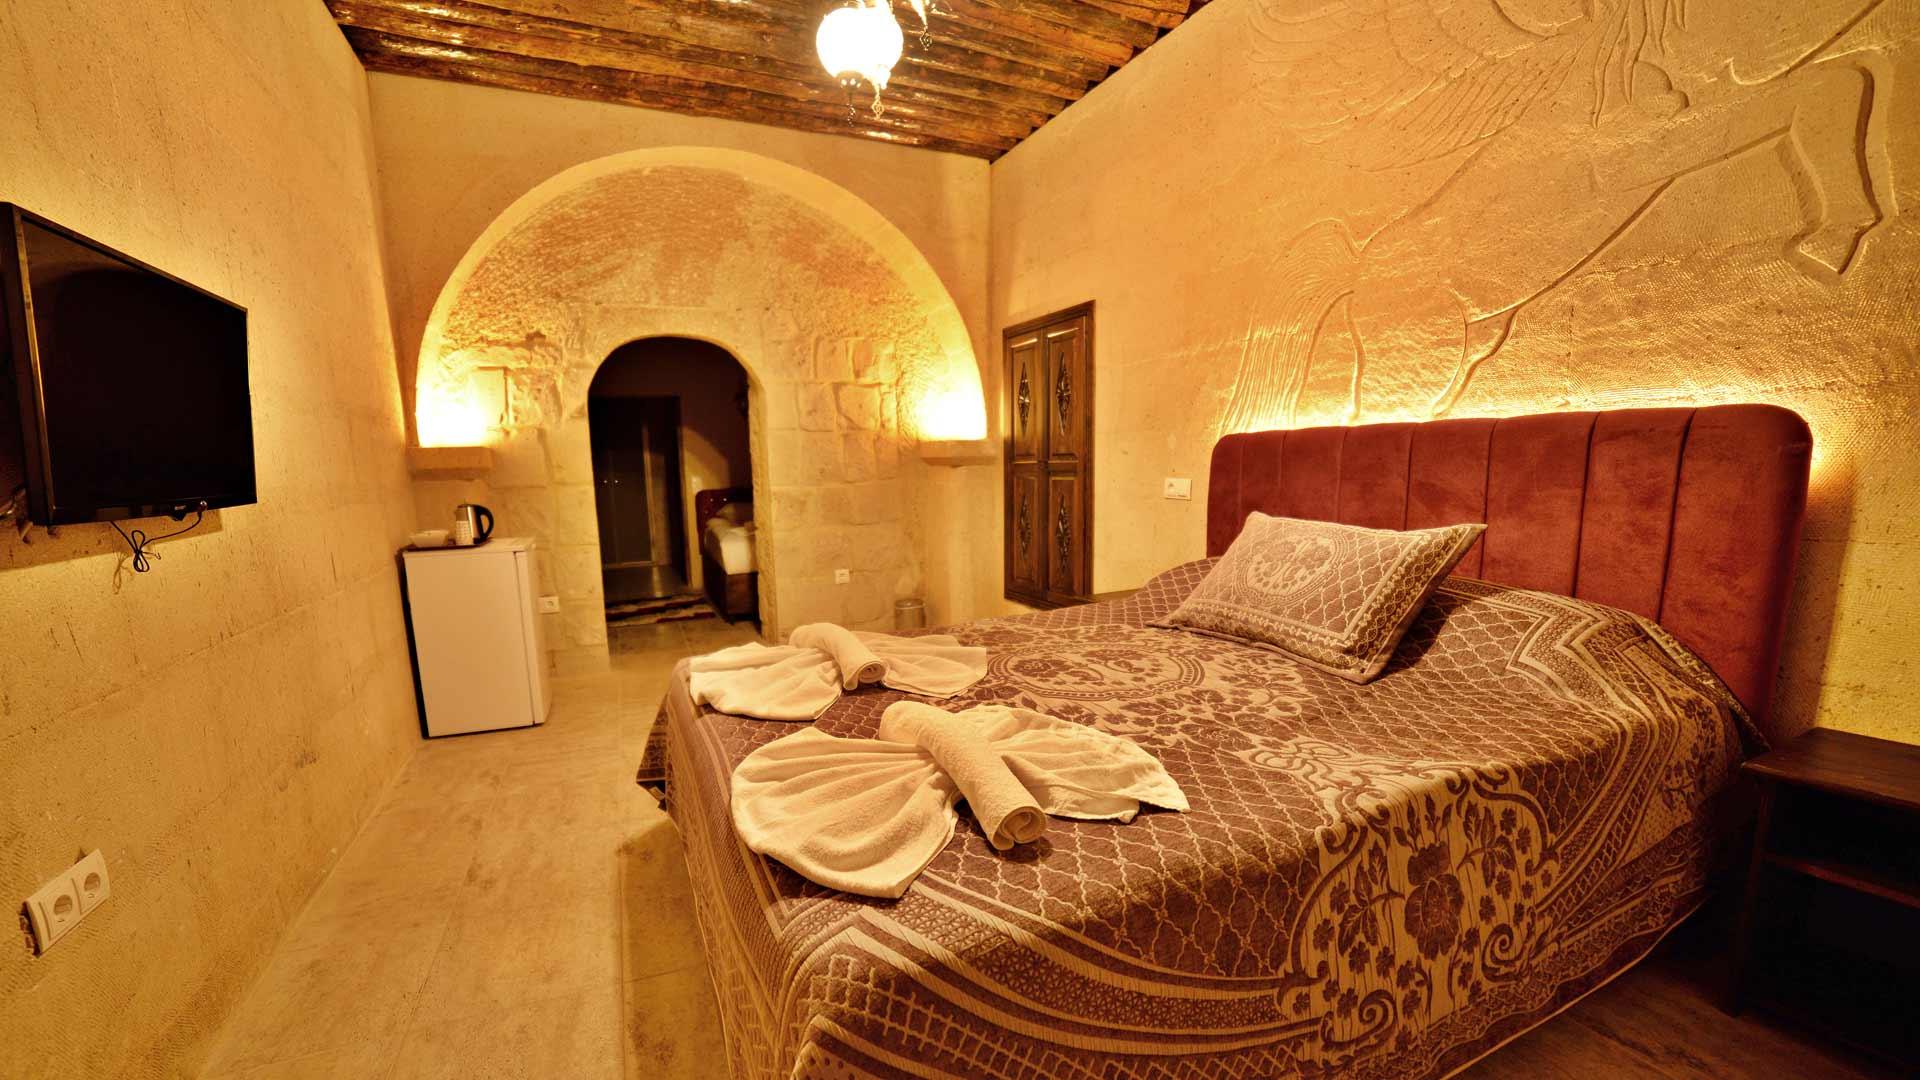 Dedeli Konak Cave Hotel Urgup Cappadocia